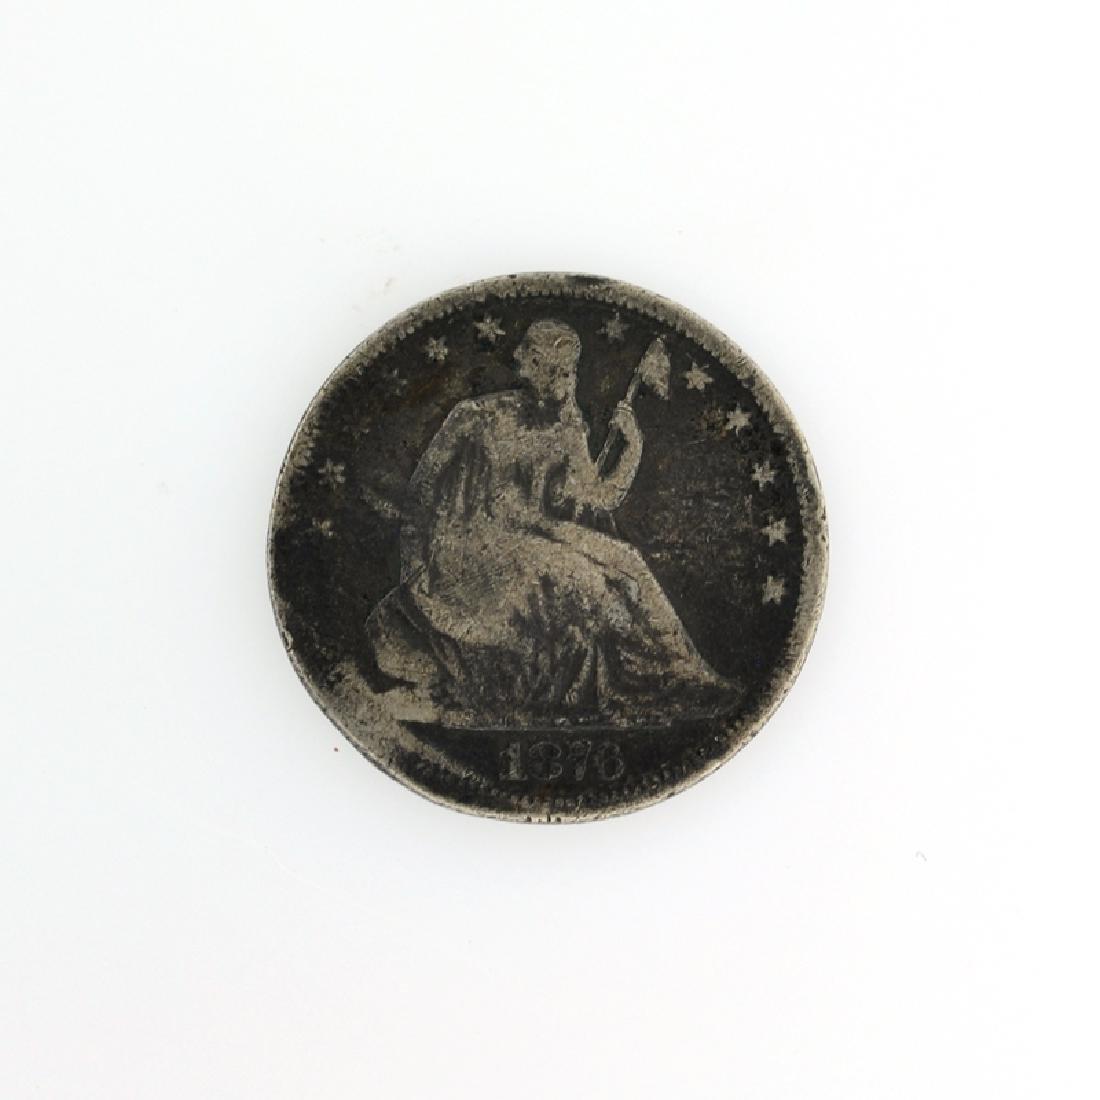 1876 Liberty Seated Half Dolla Coin